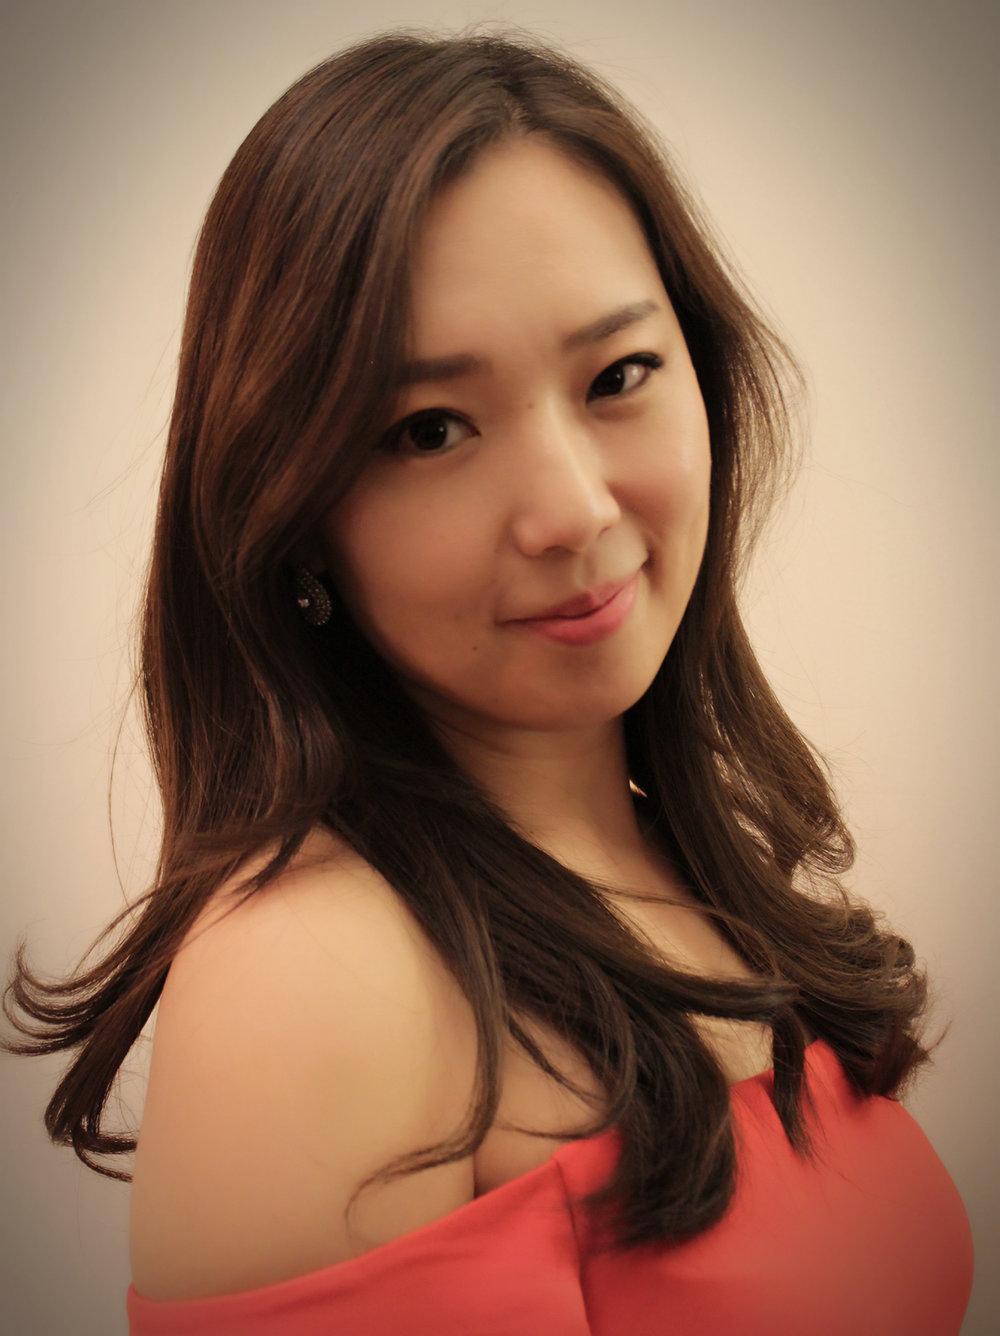 Nayoung Ban Headshot.jpeg